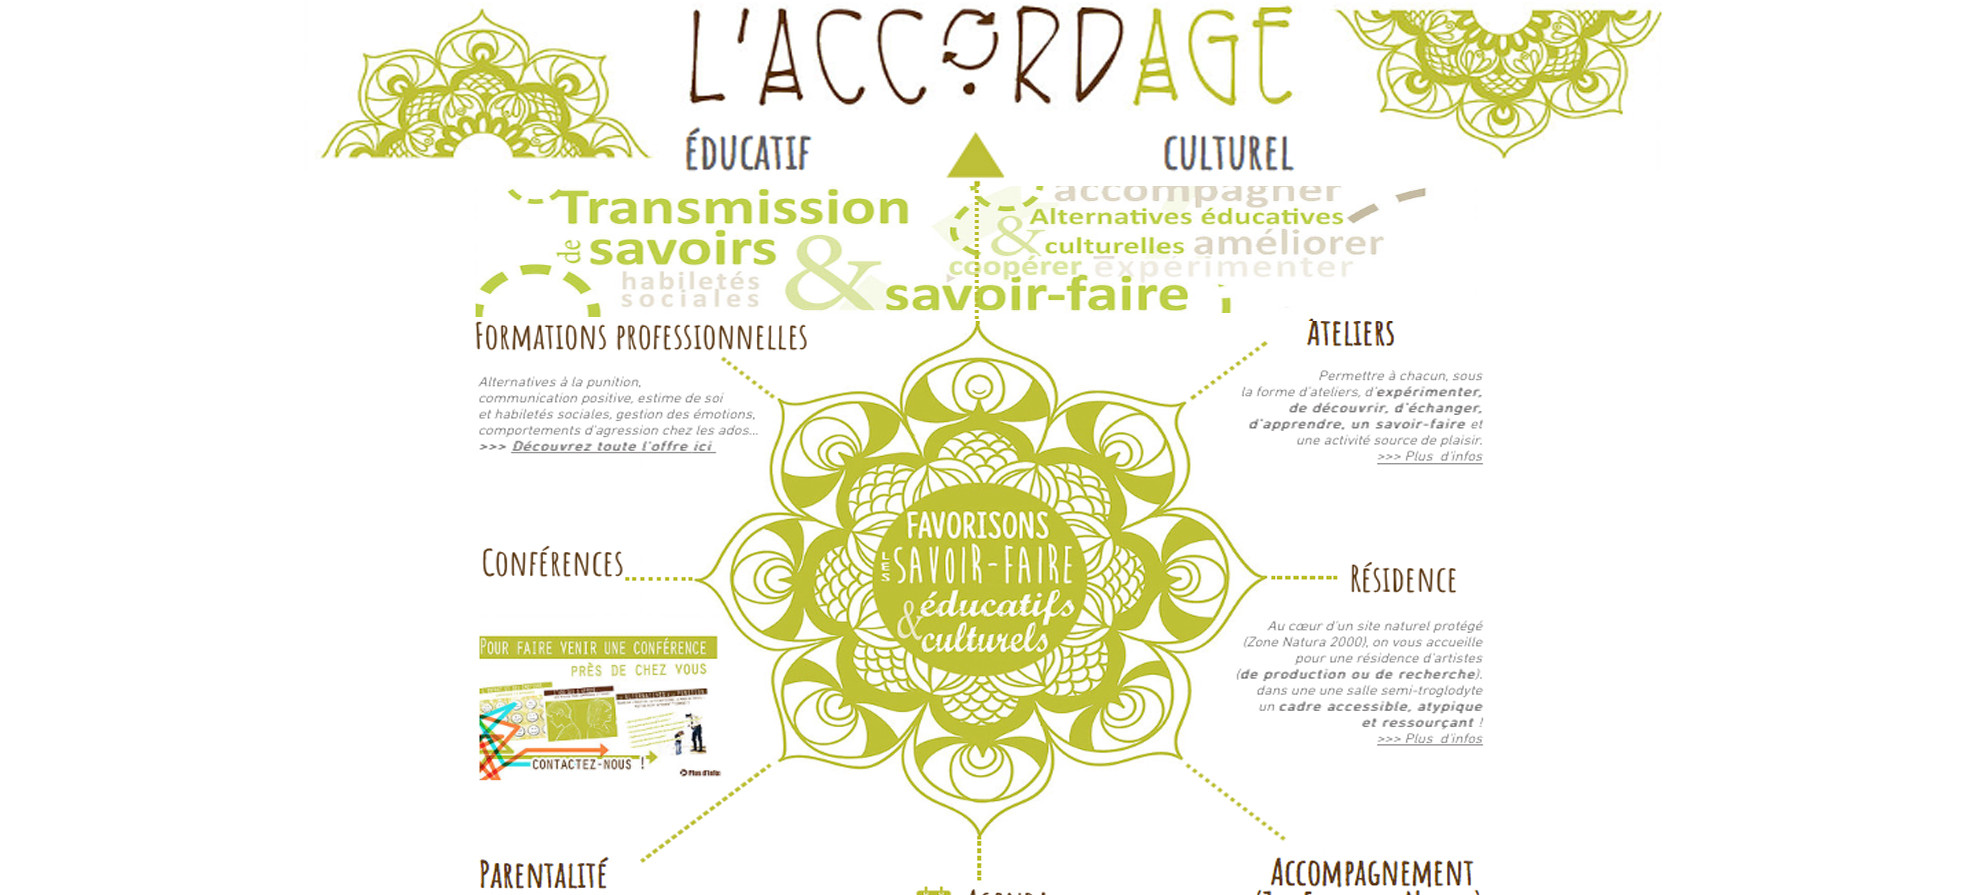 0191c13d433f7 Agenda | L'Accordage - formations/conférences/ateliers/résidence ...